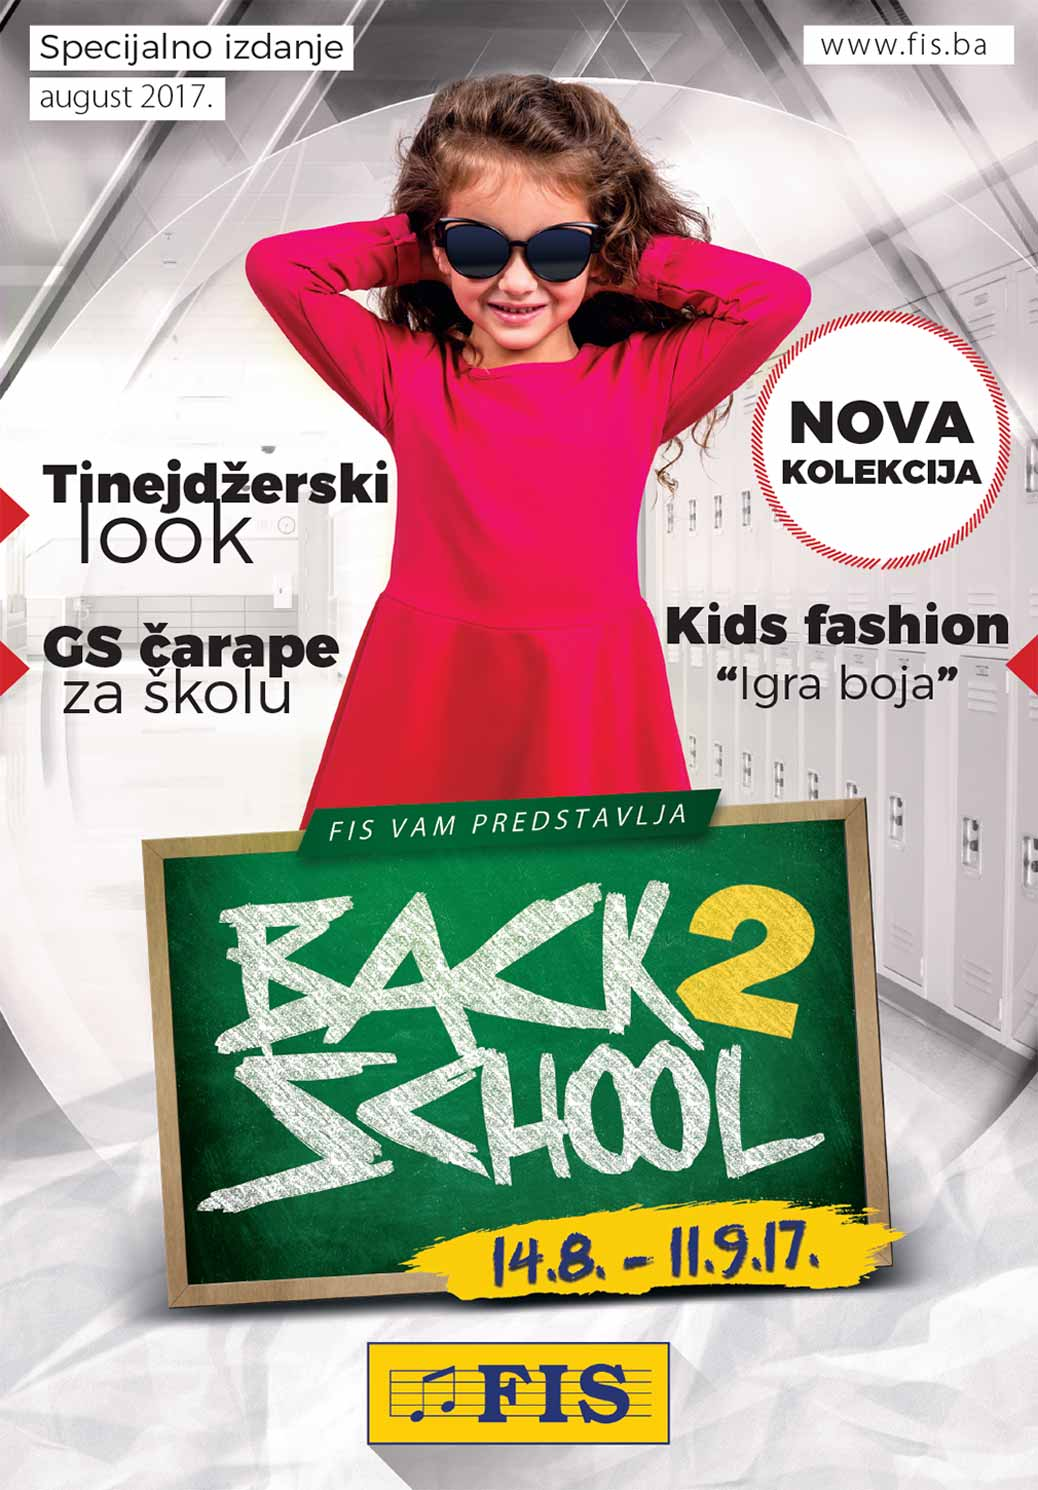 Fis katalog Back to school 2 - 11.09.2017.